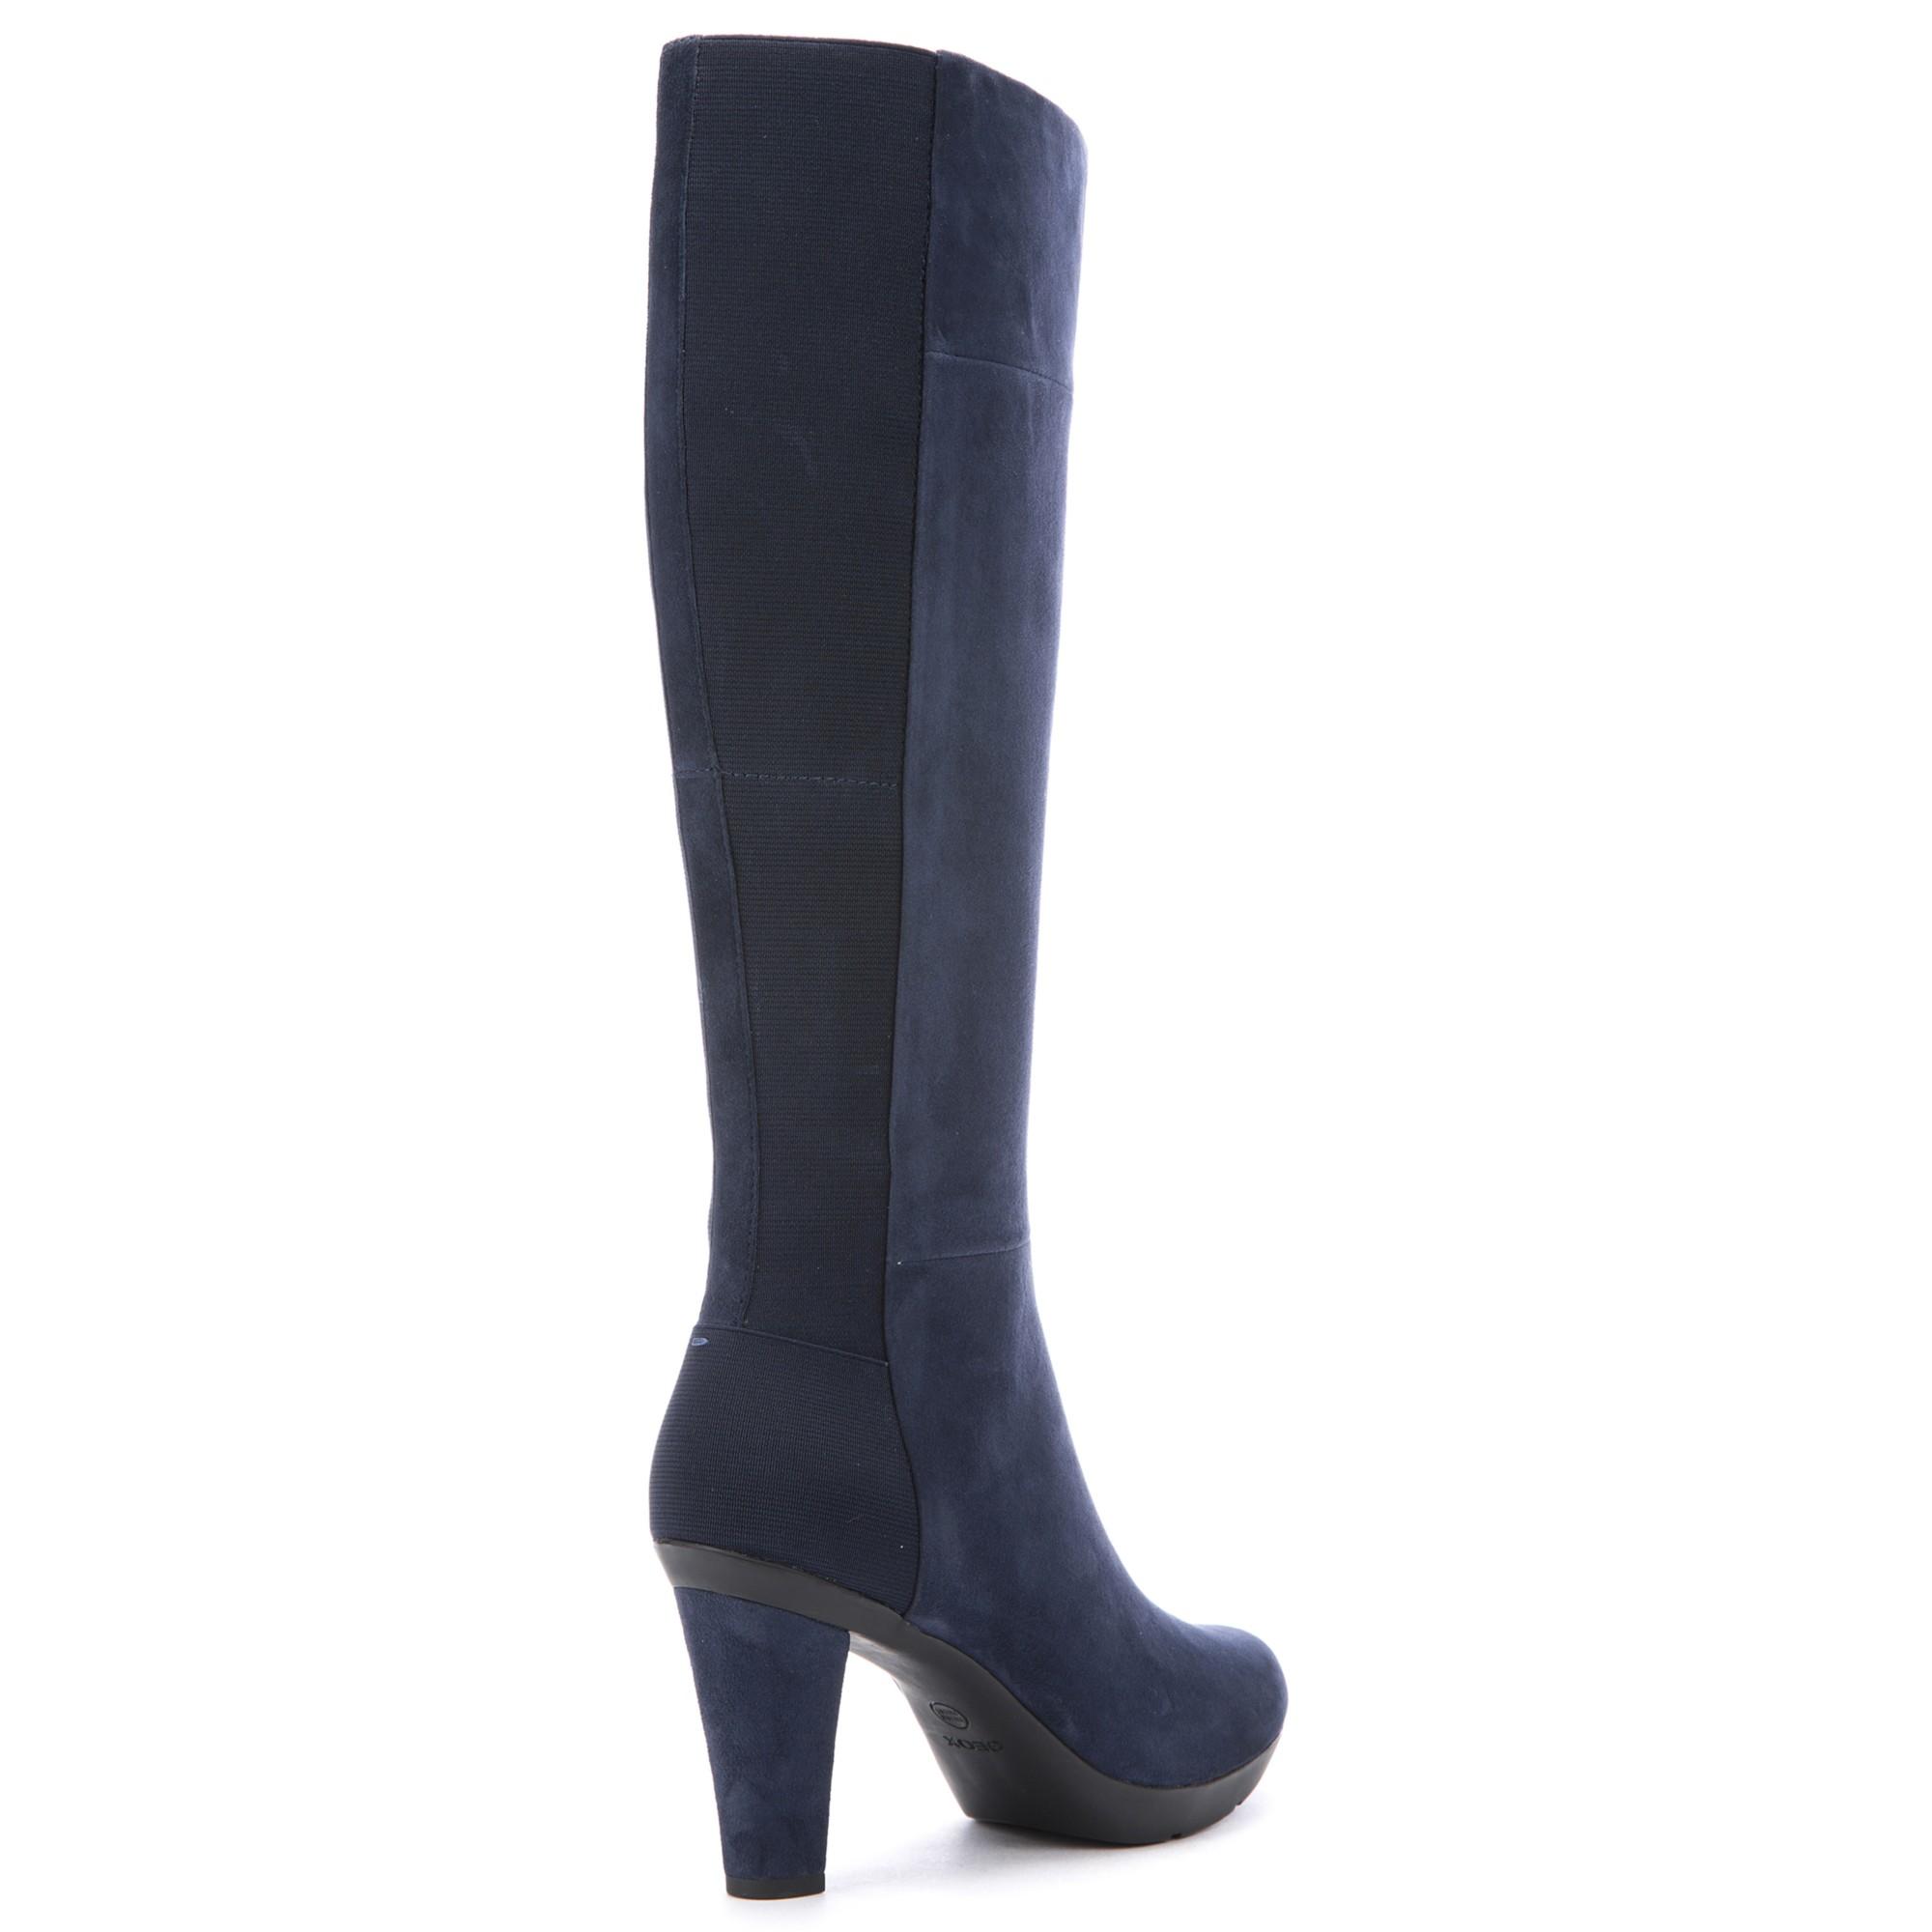 e0b988d7ec835 Geox Inspiration High Heeled Knee High Boots in Blue - Lyst